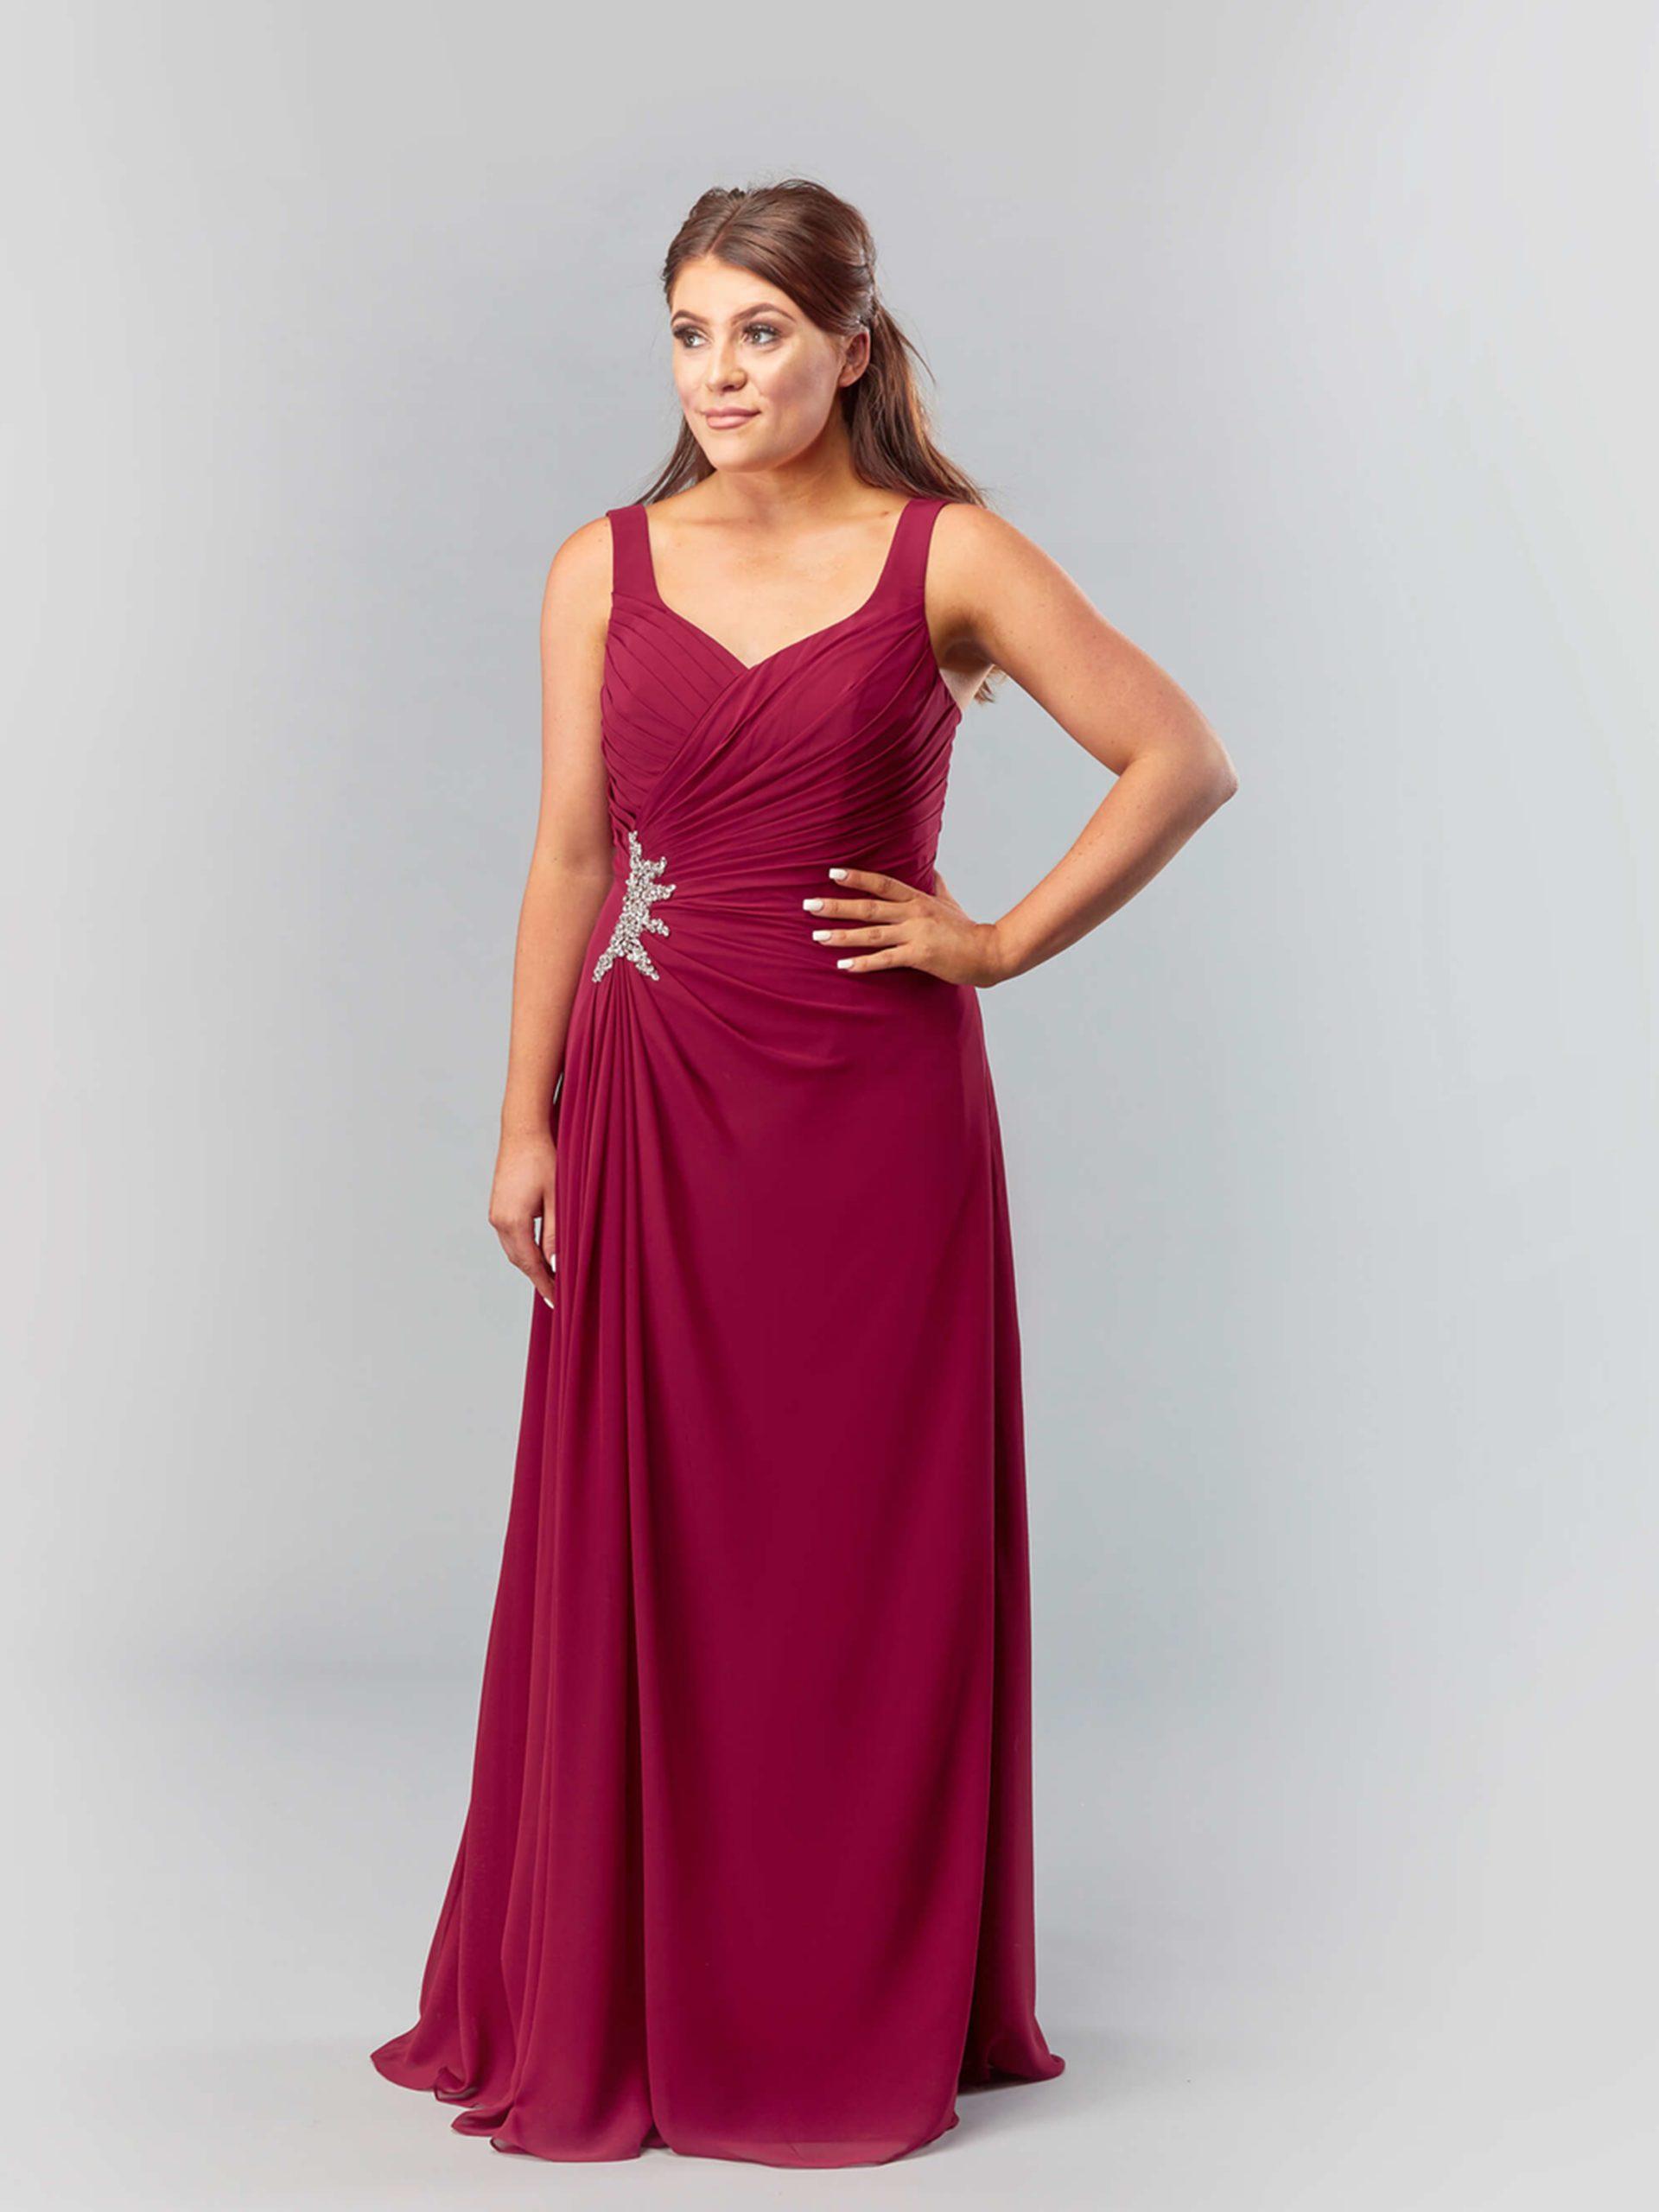 MAB05-burgundy chiffon bridesmaid dress 1